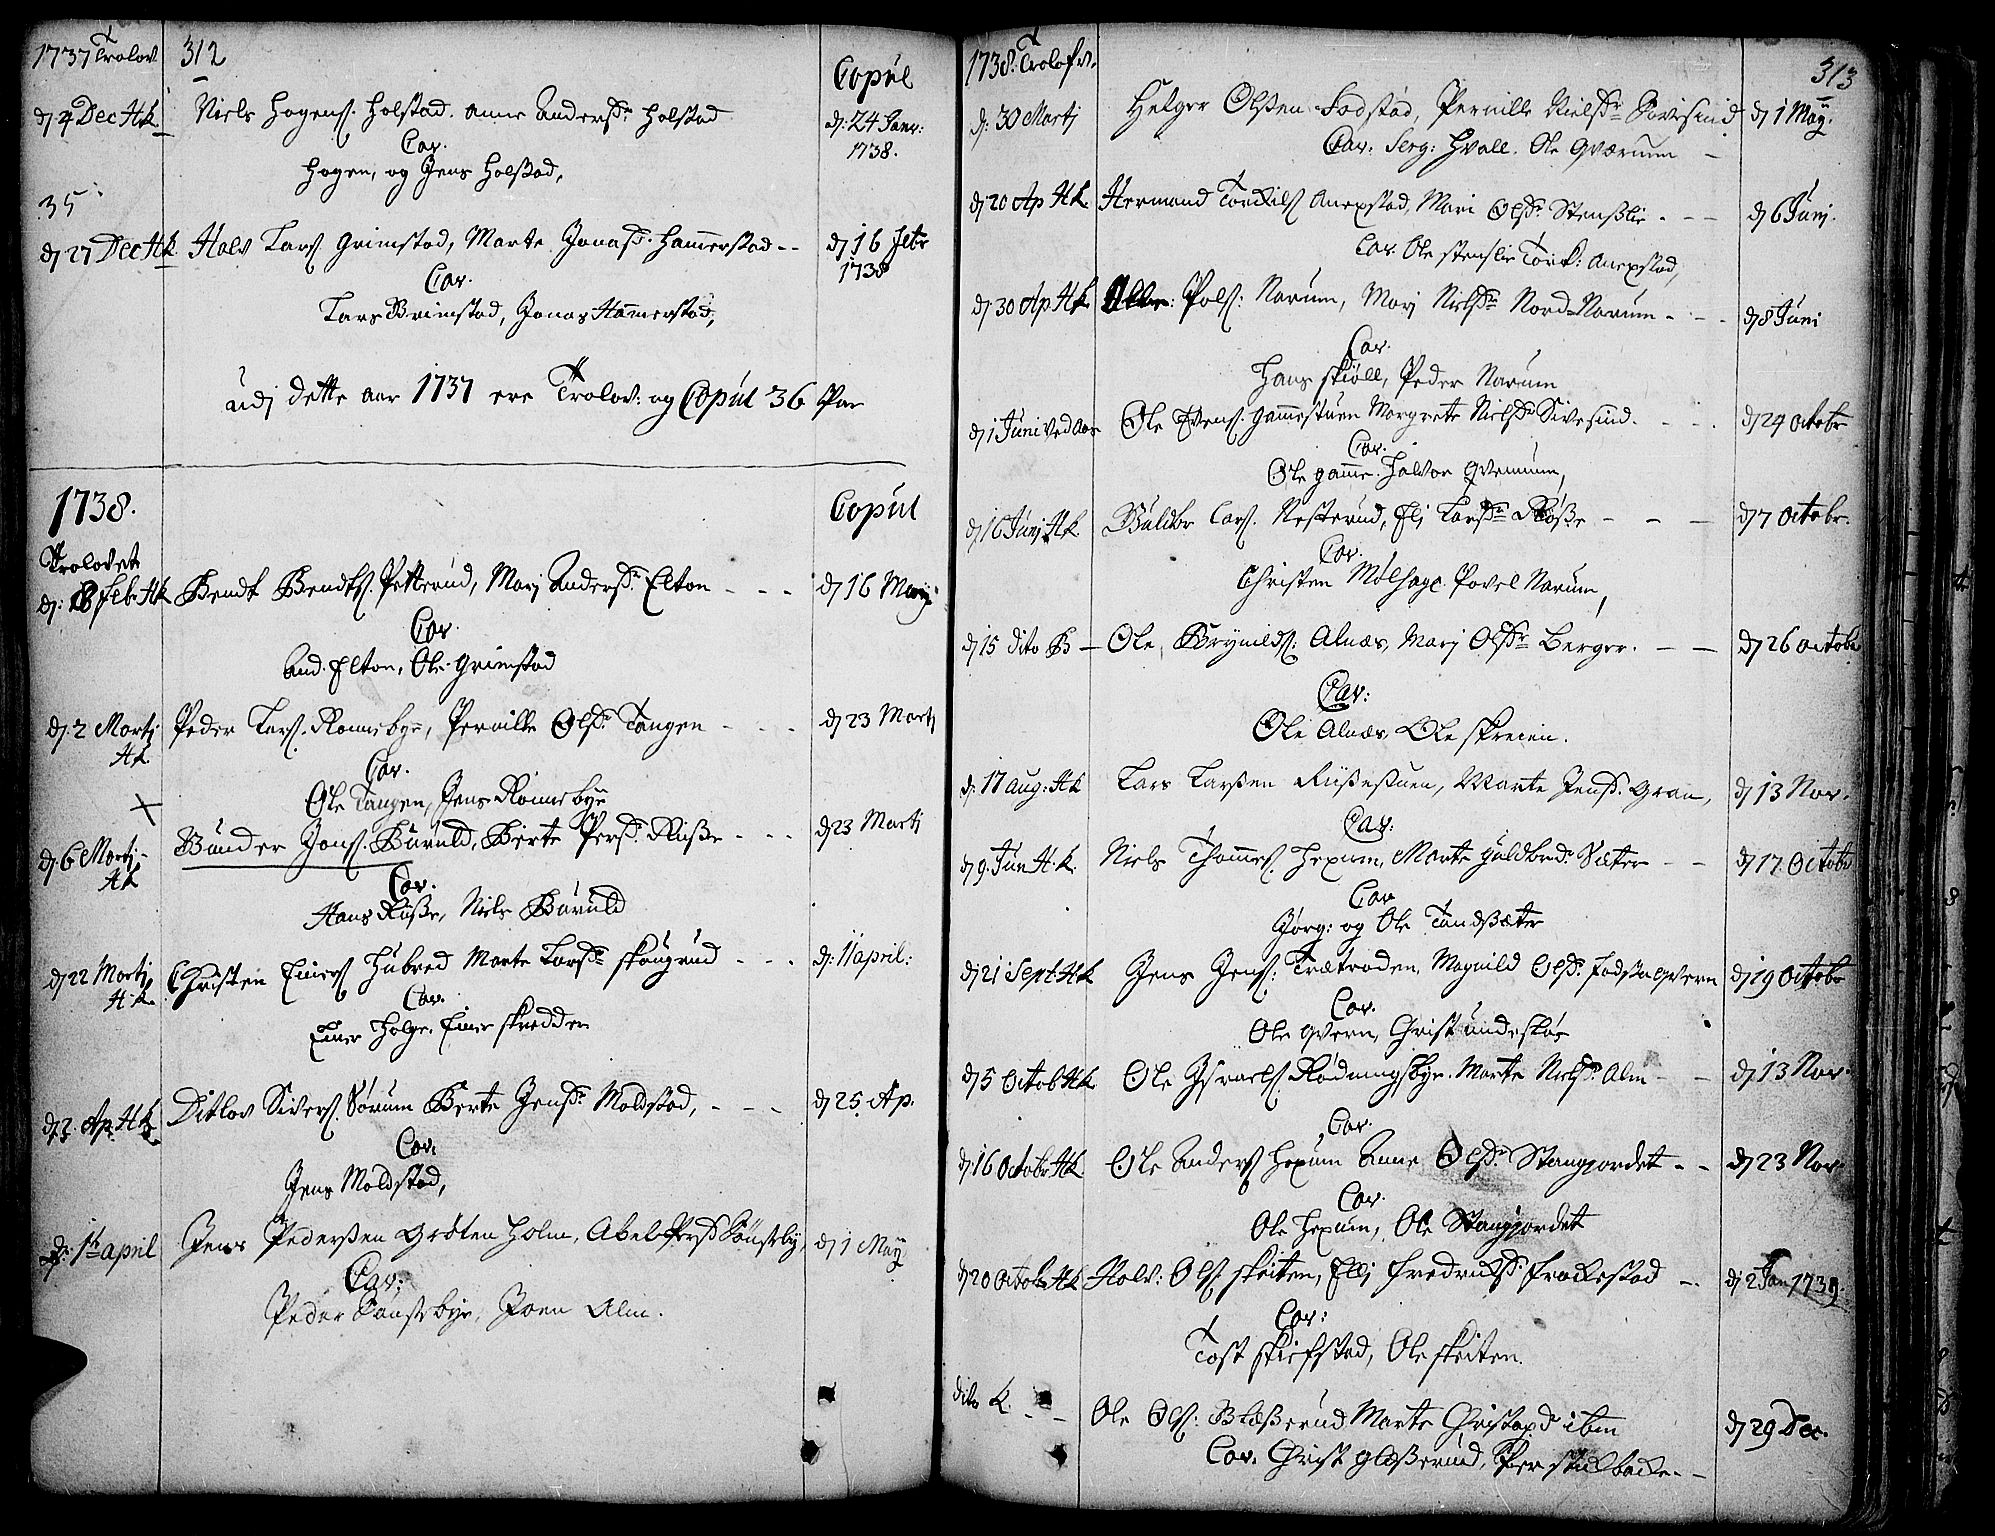 SAH, Toten prestekontor, Ministerialbok nr. 3, 1734-1751, s. 312-313